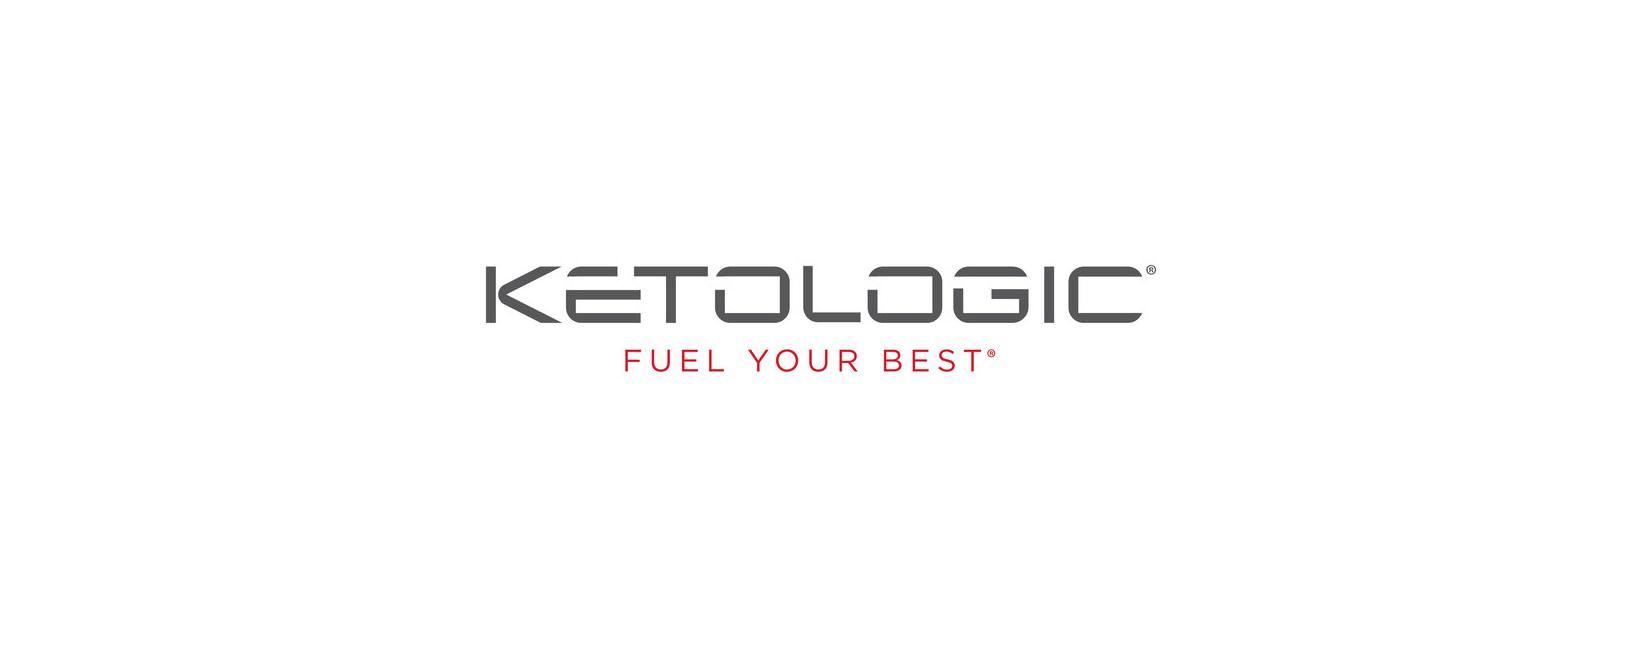 KetoLogic Discount Code 2021